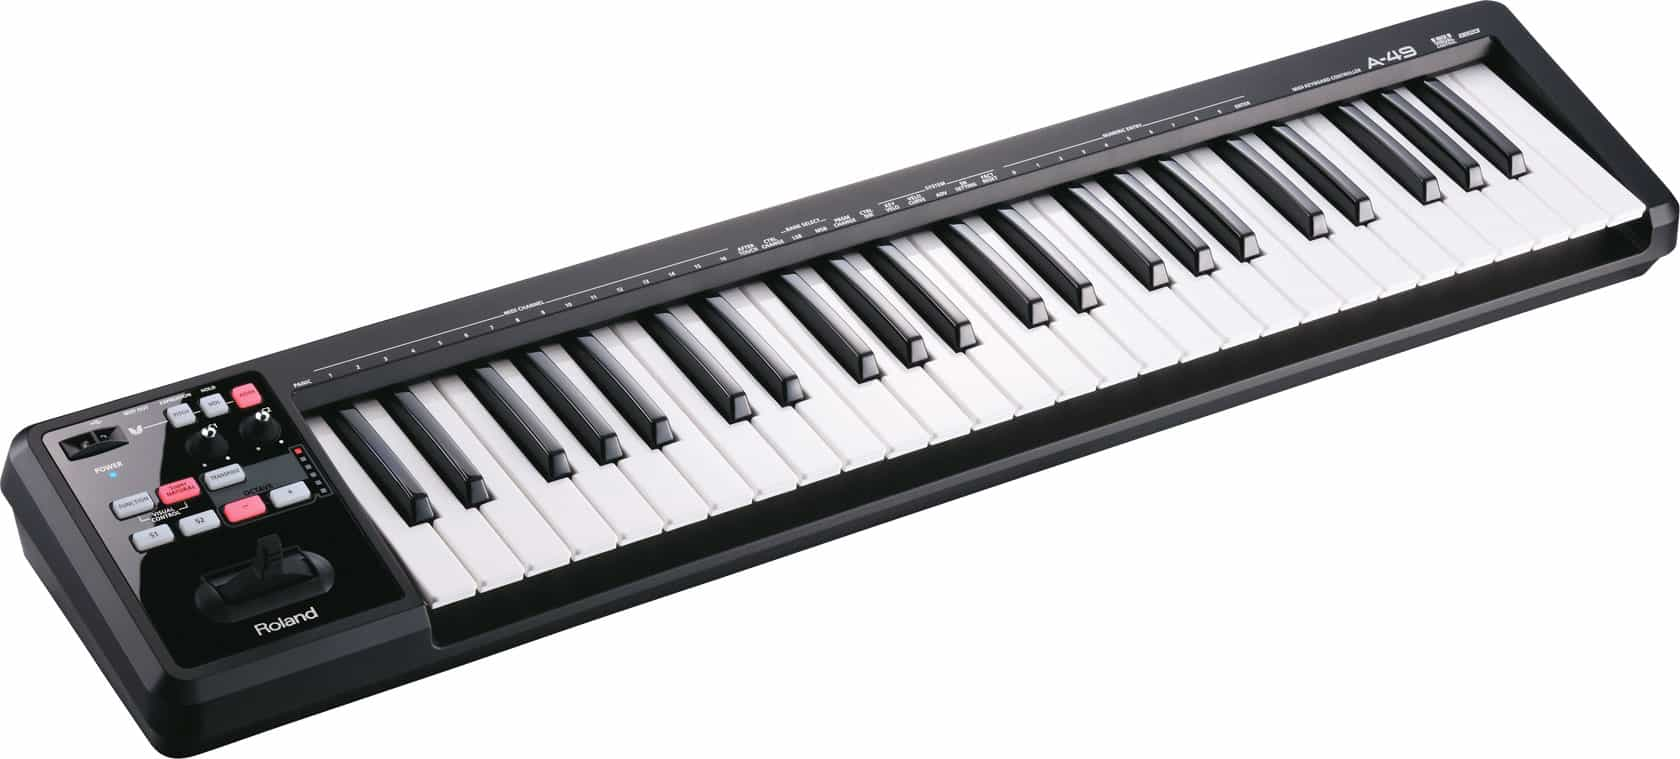 Professional midi keyboards